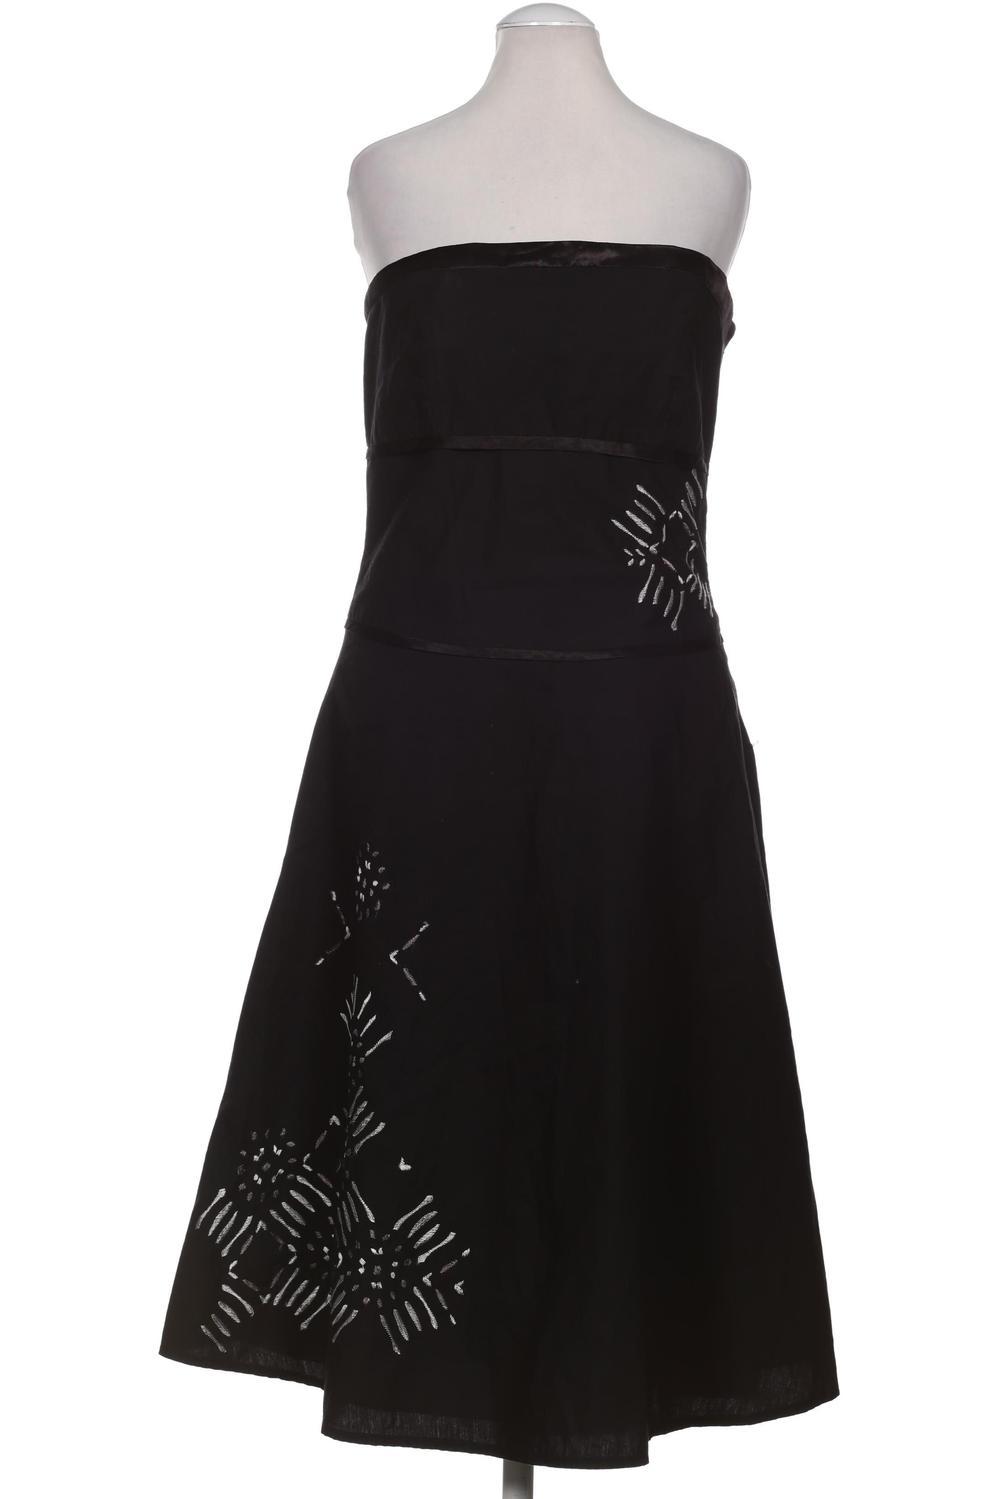 details zu zero kleid damen dress damenkleid gr. de 38 baumwolle schwarz  #aea28a4